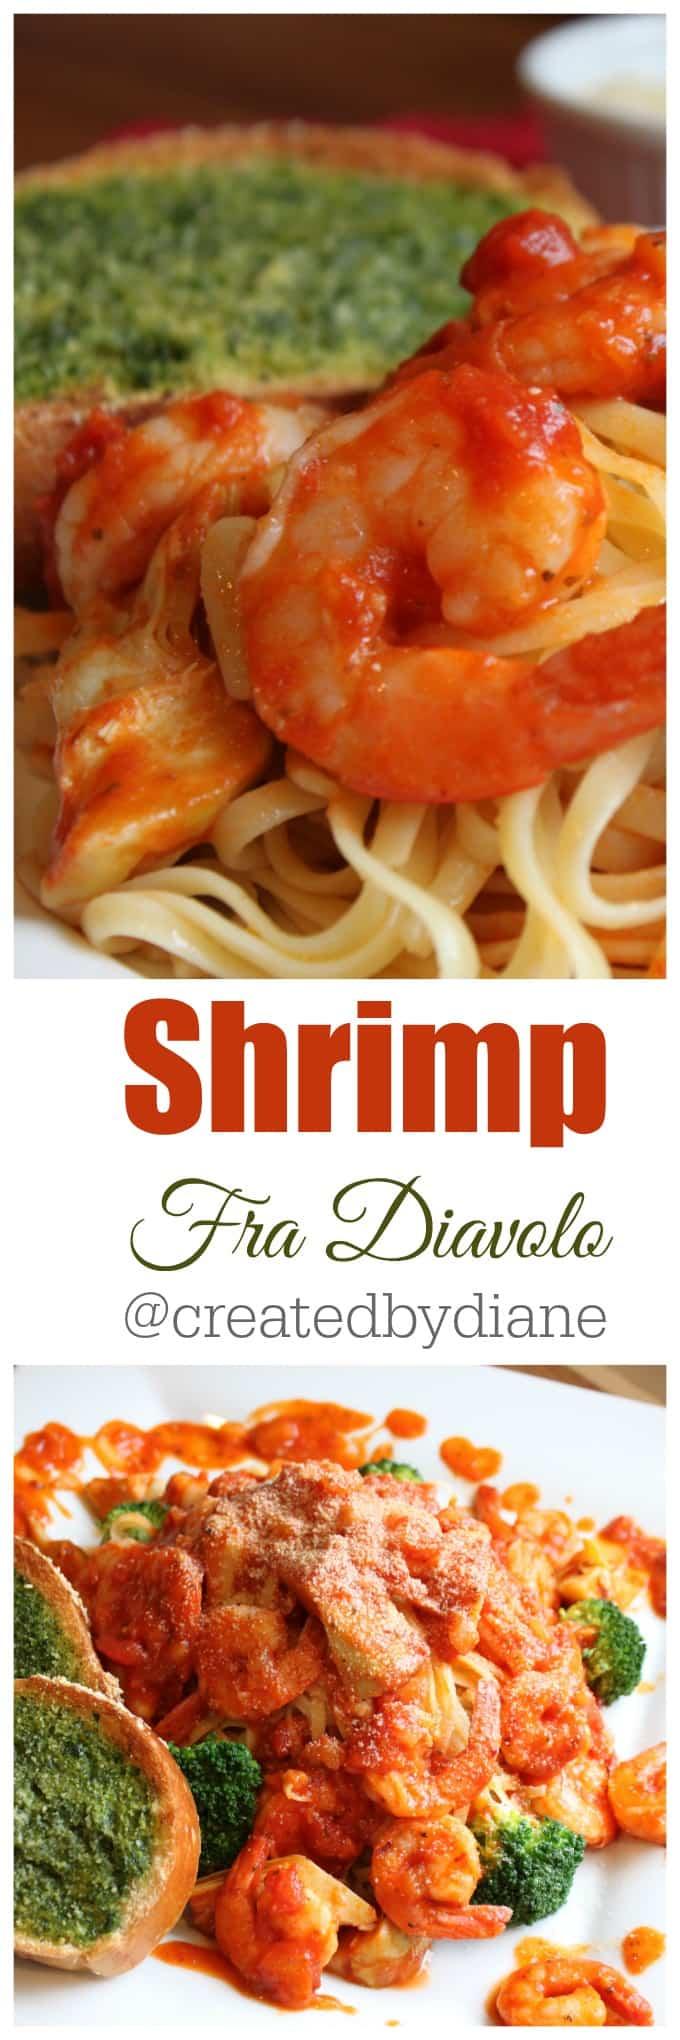 shrimp fra diavolo @createdbydiane